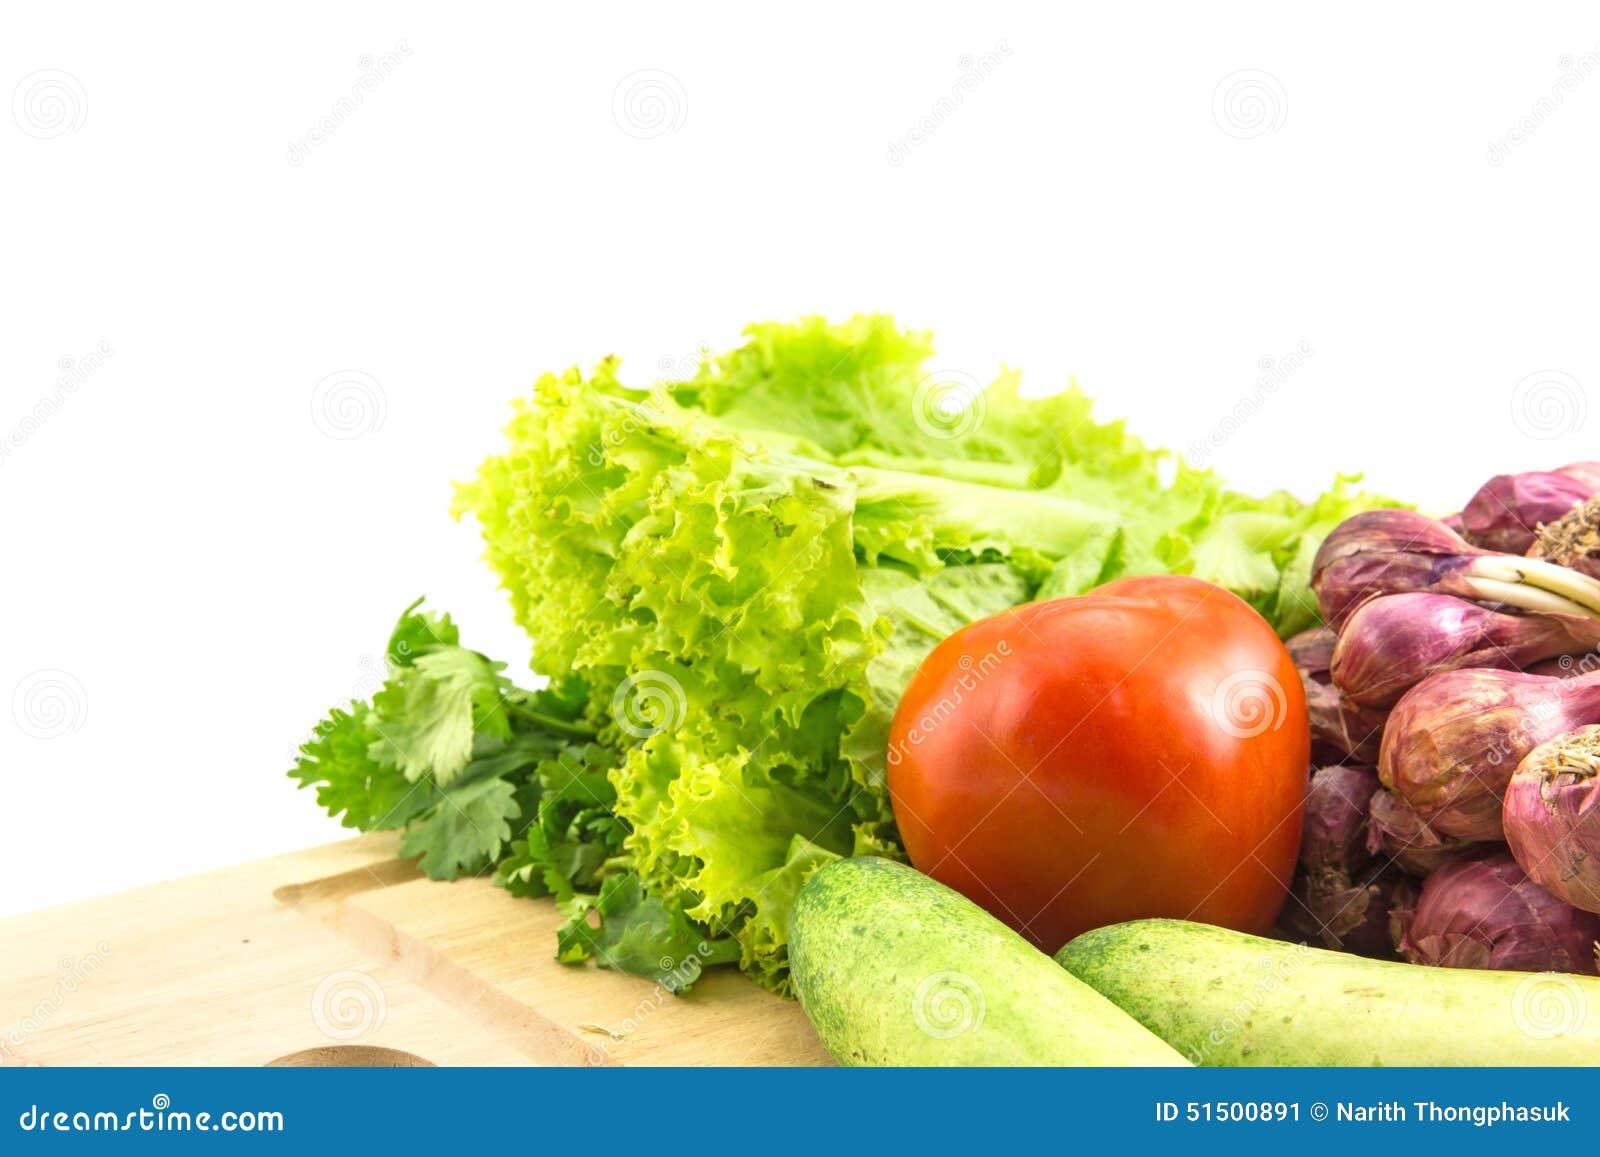 Natural Organic Butcher